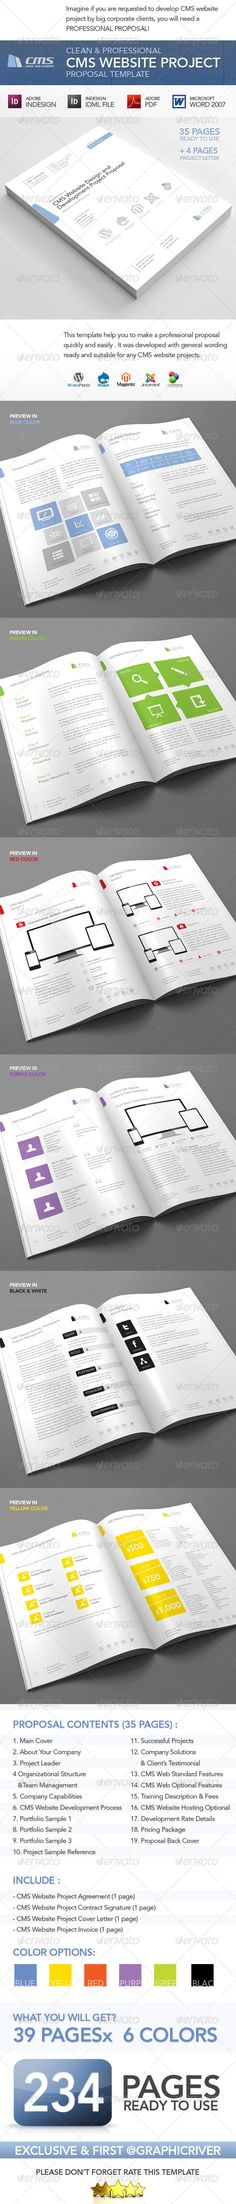 Bundle - Creative \ Minimal Business Card - 14 Creative, Minimal - project proposals